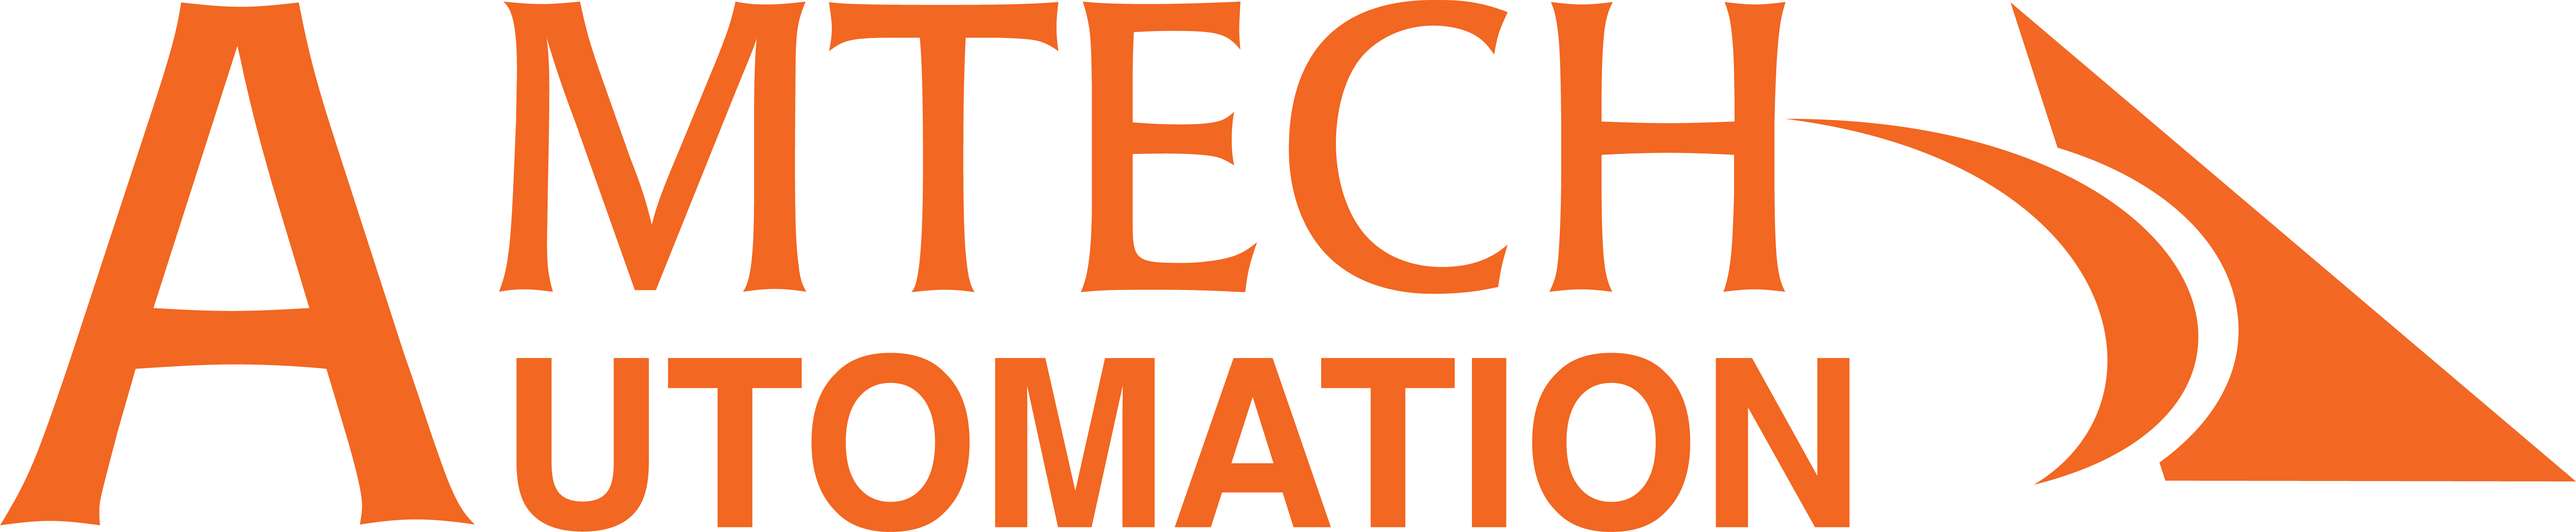 orangeamtechautomation-1